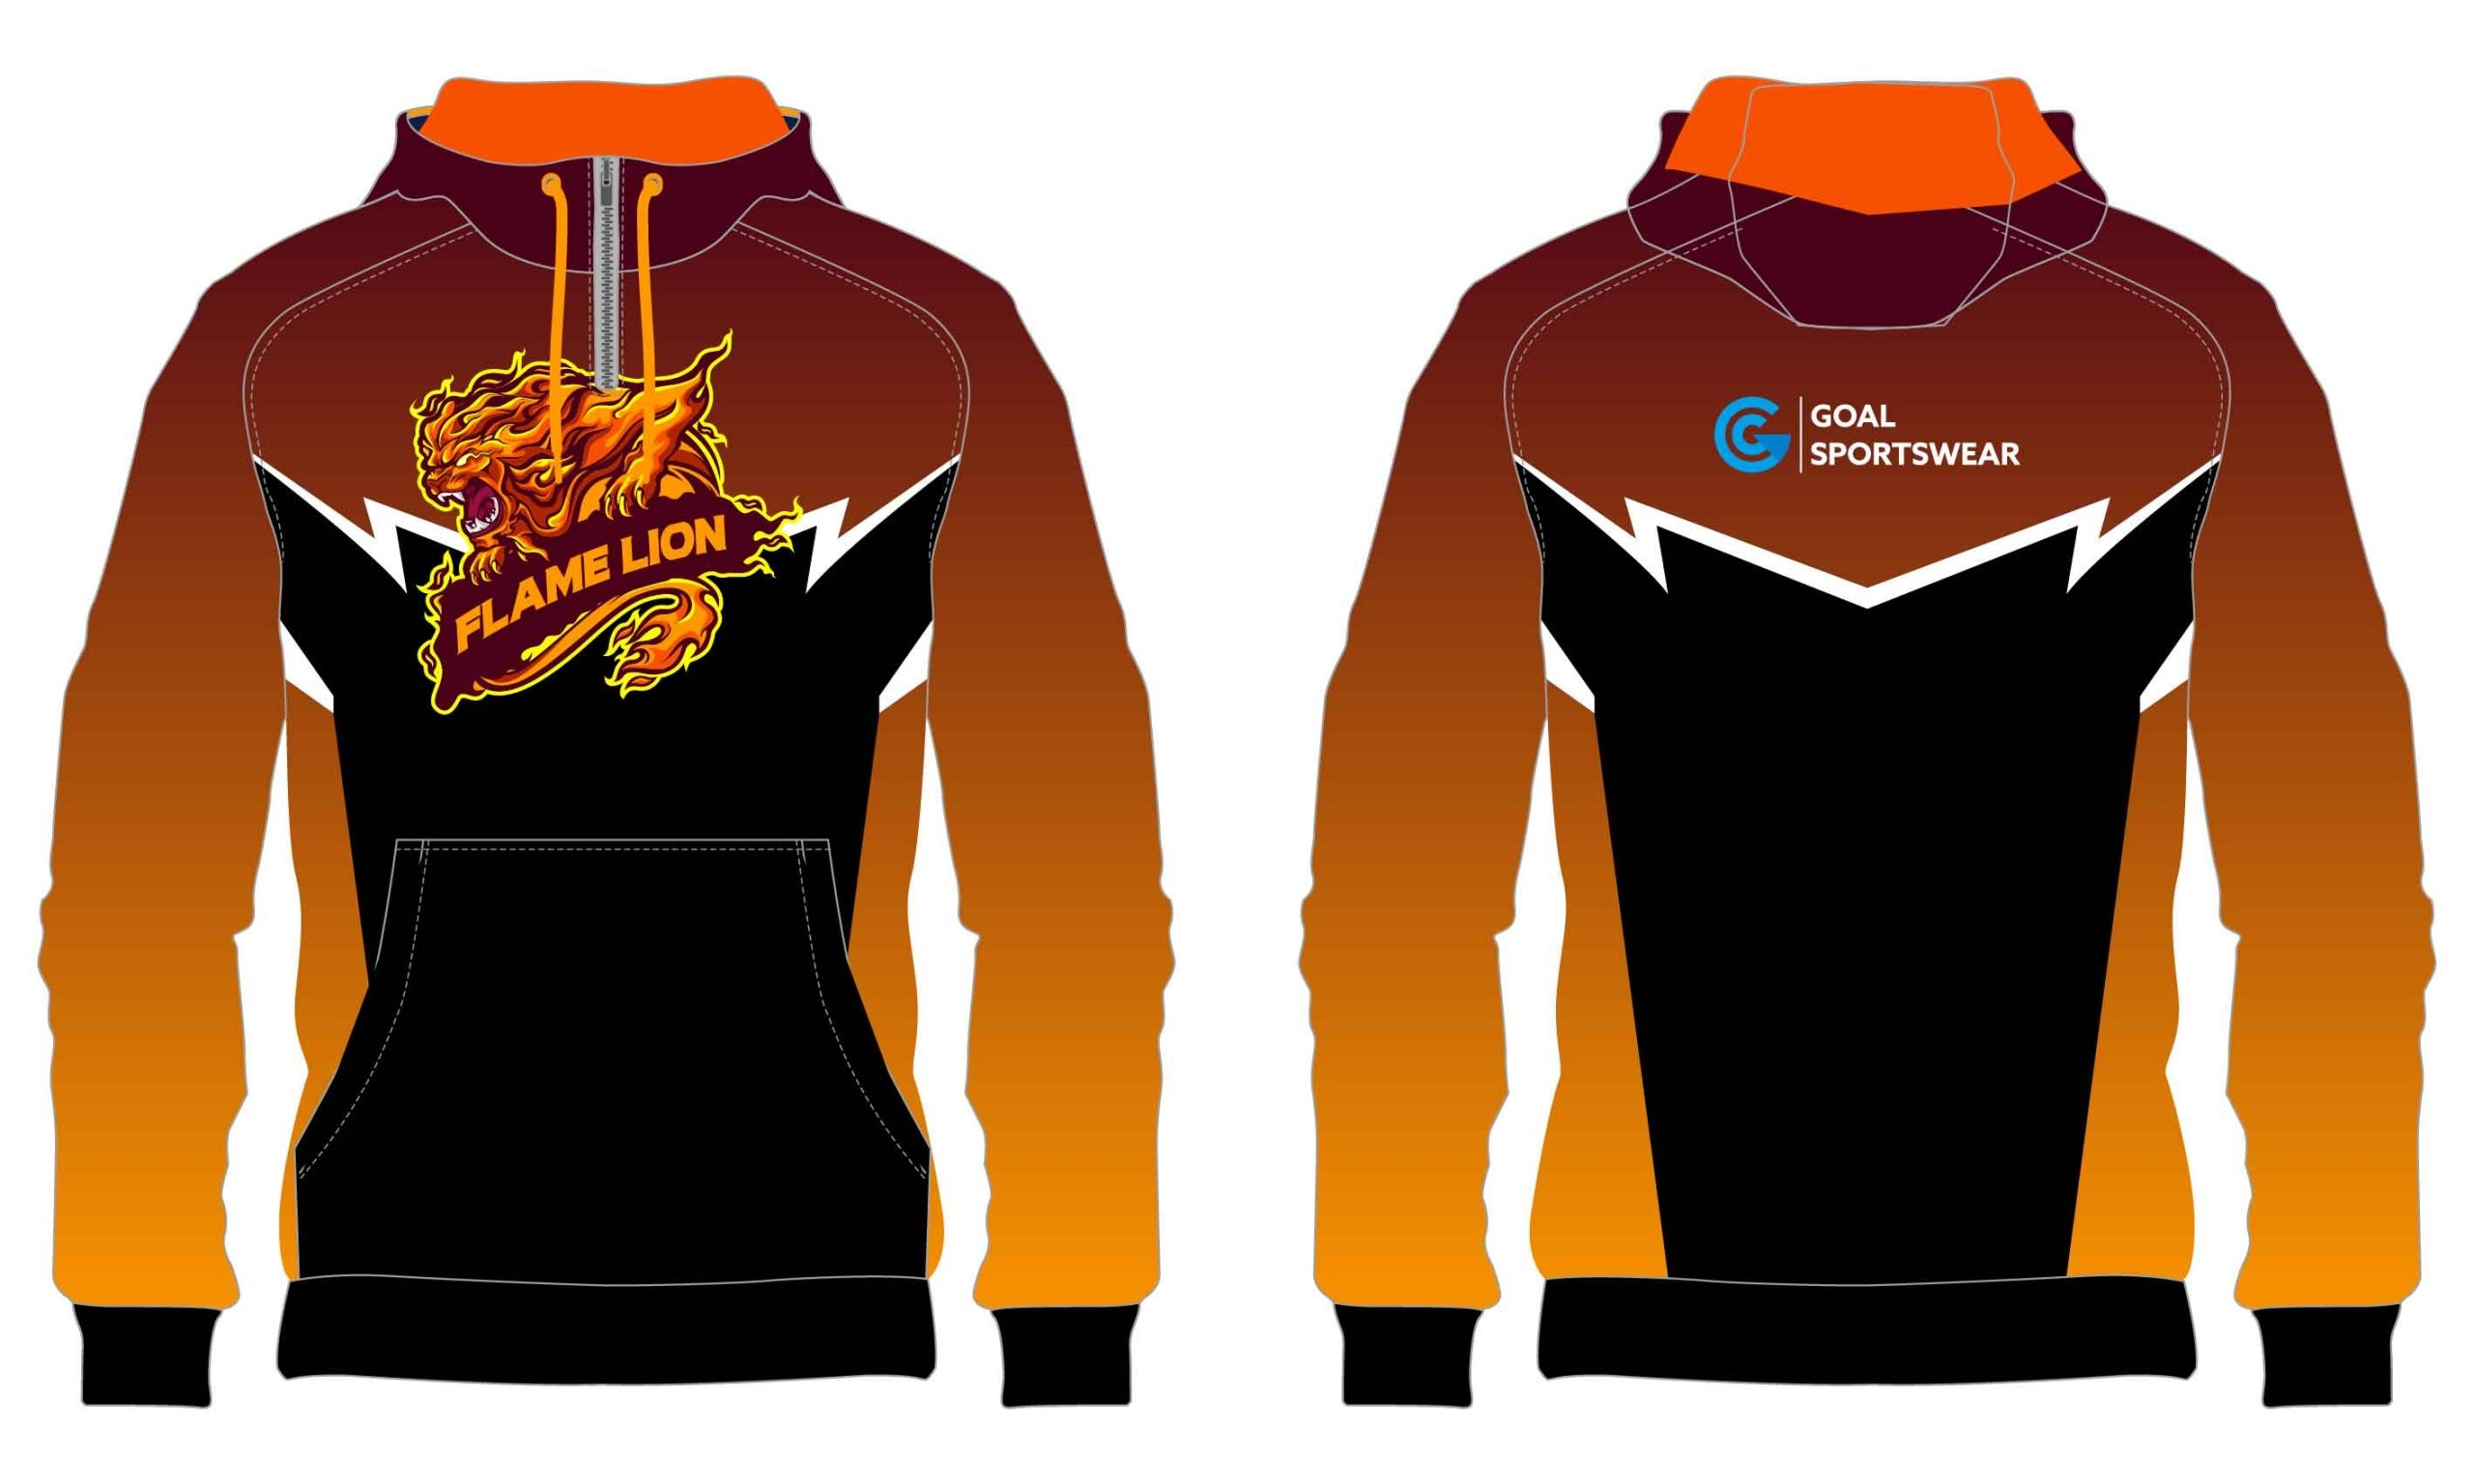 Full polyester breathable custom design sublimated wrestling sweatshirts